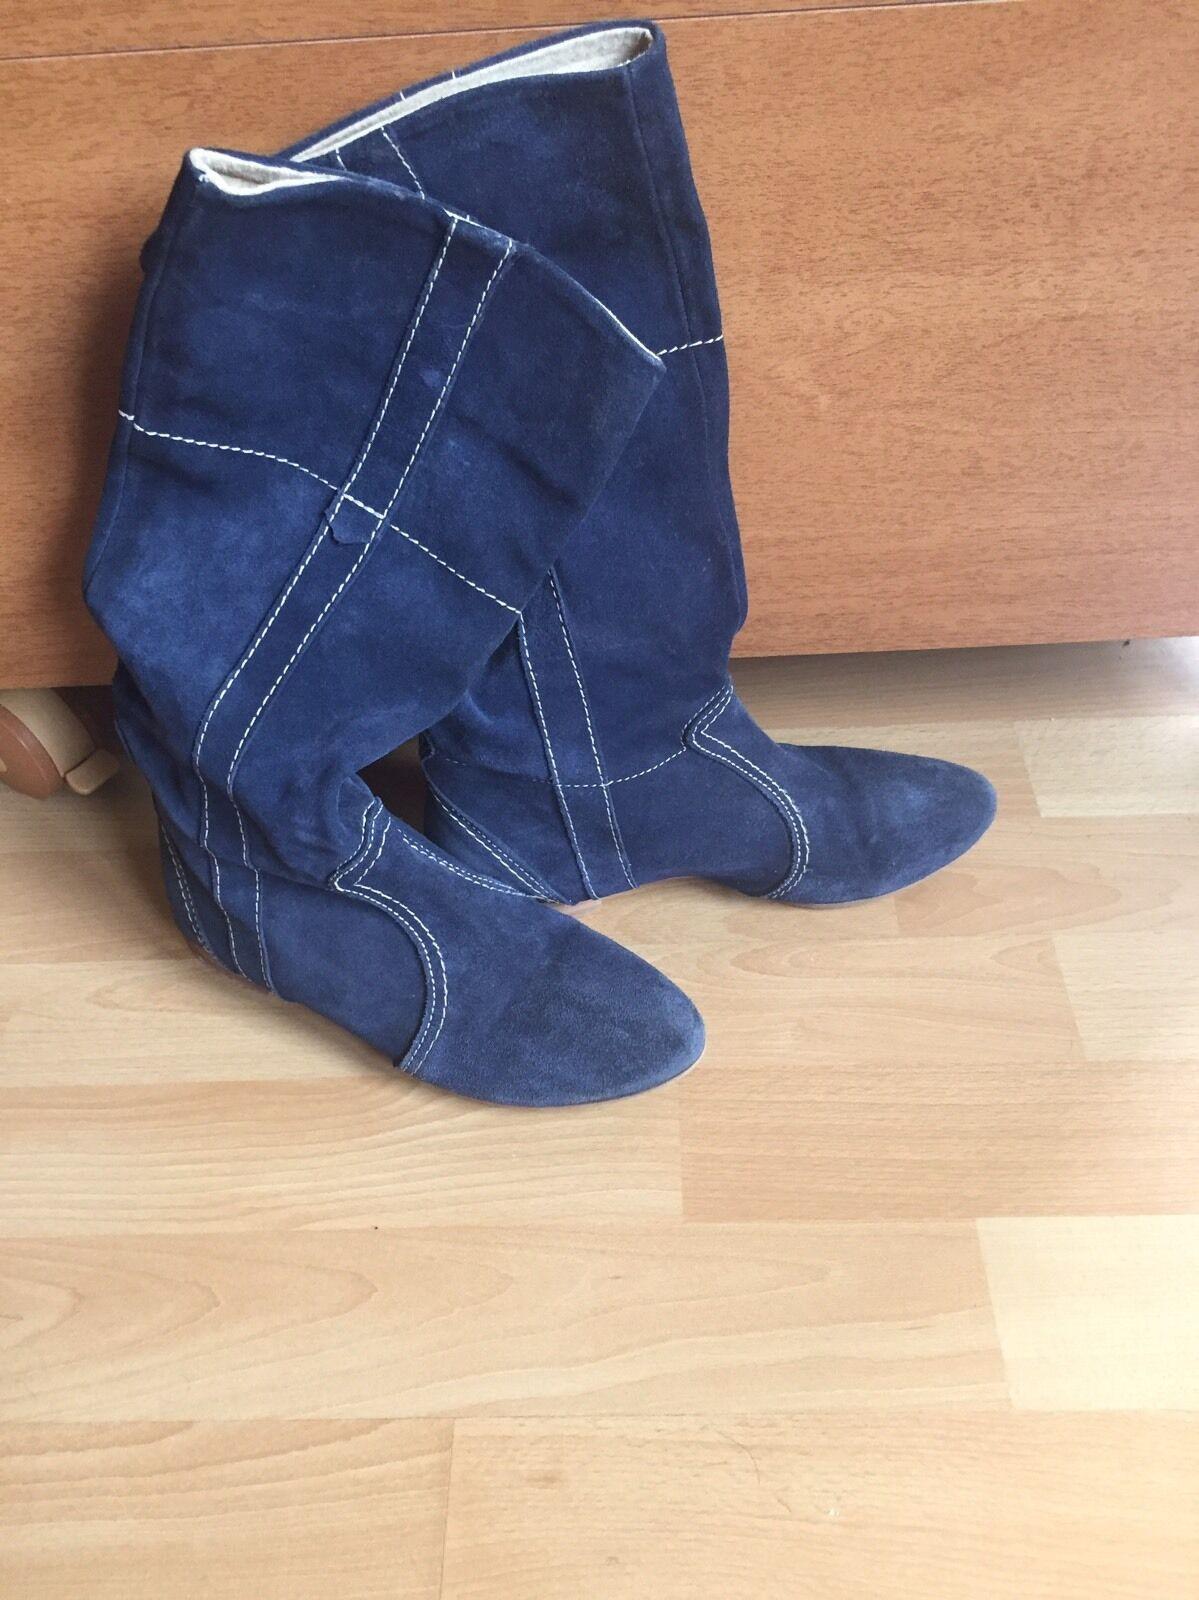 Damen Stiefel Wildleder Italien Gr.36 Gr.36 Gr.36 a070a9